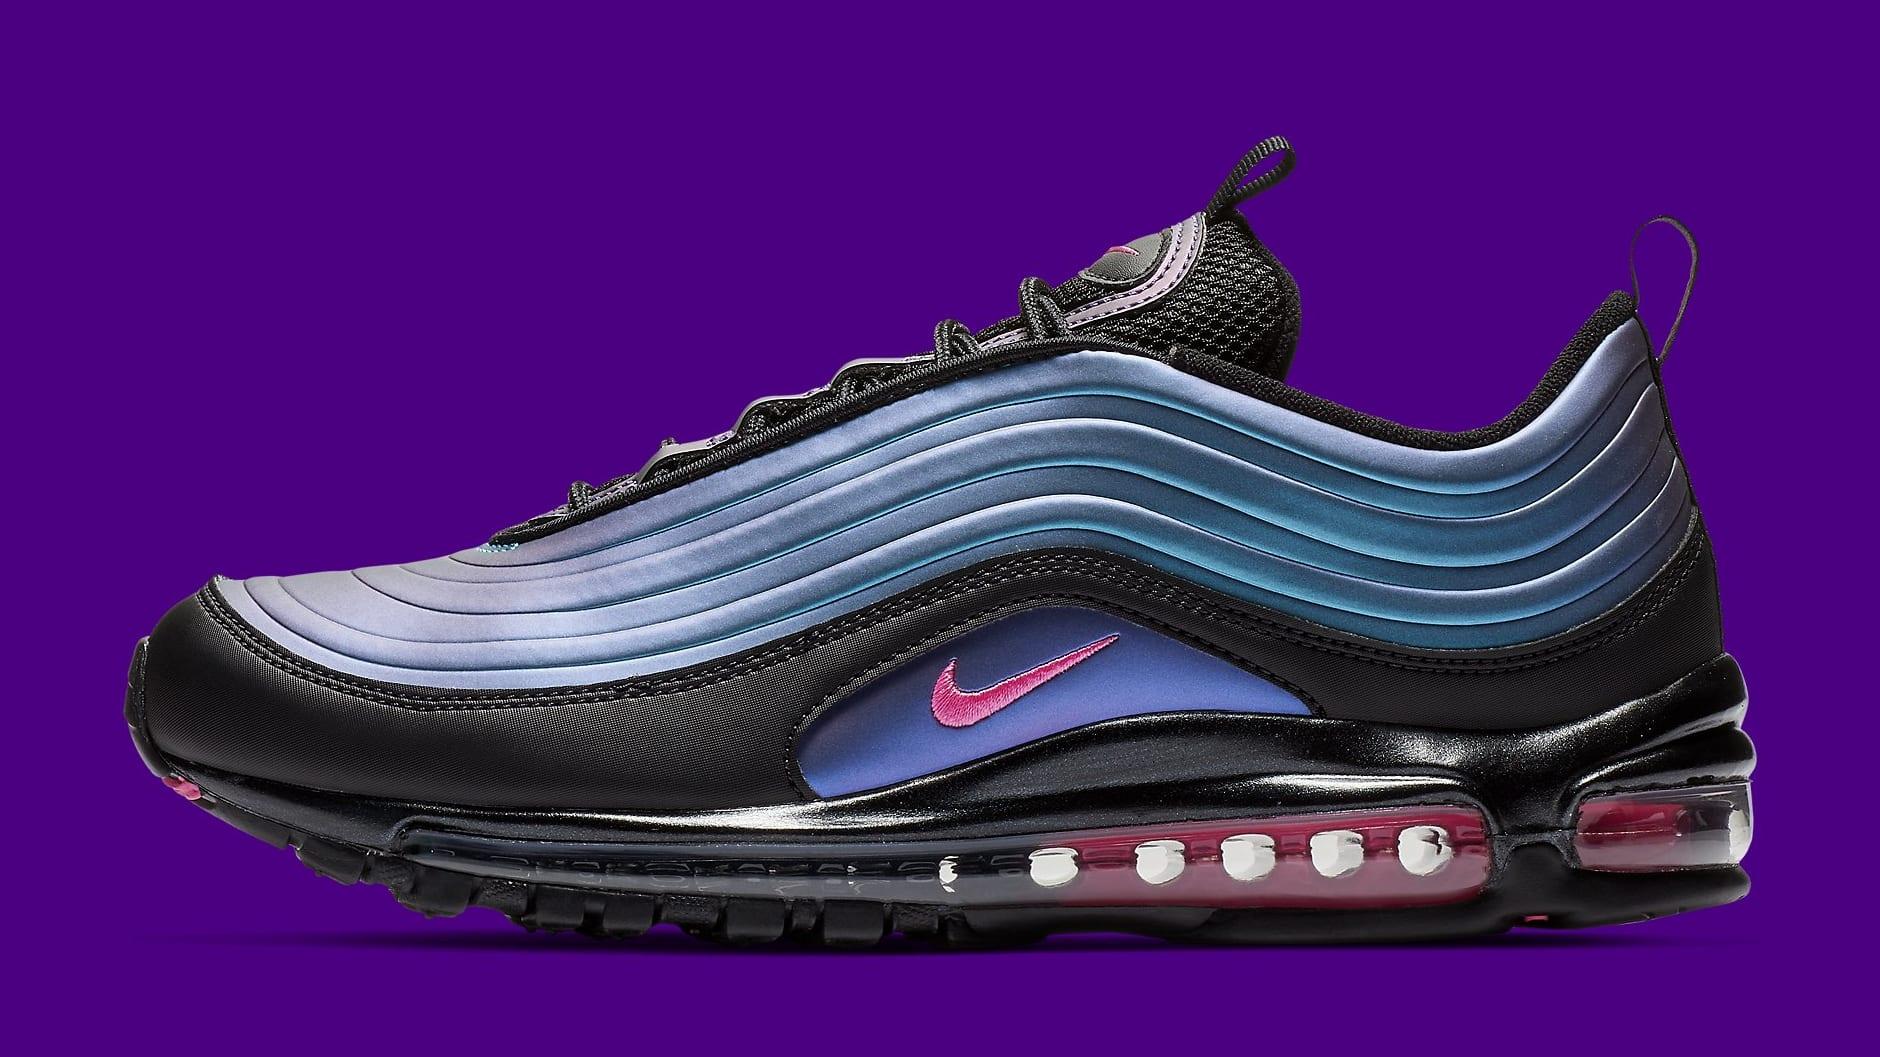 lowest price 00eca 8ba1f Image via Nike Nike Air Max 97  Throwback Future  AV1165-001 Lateral